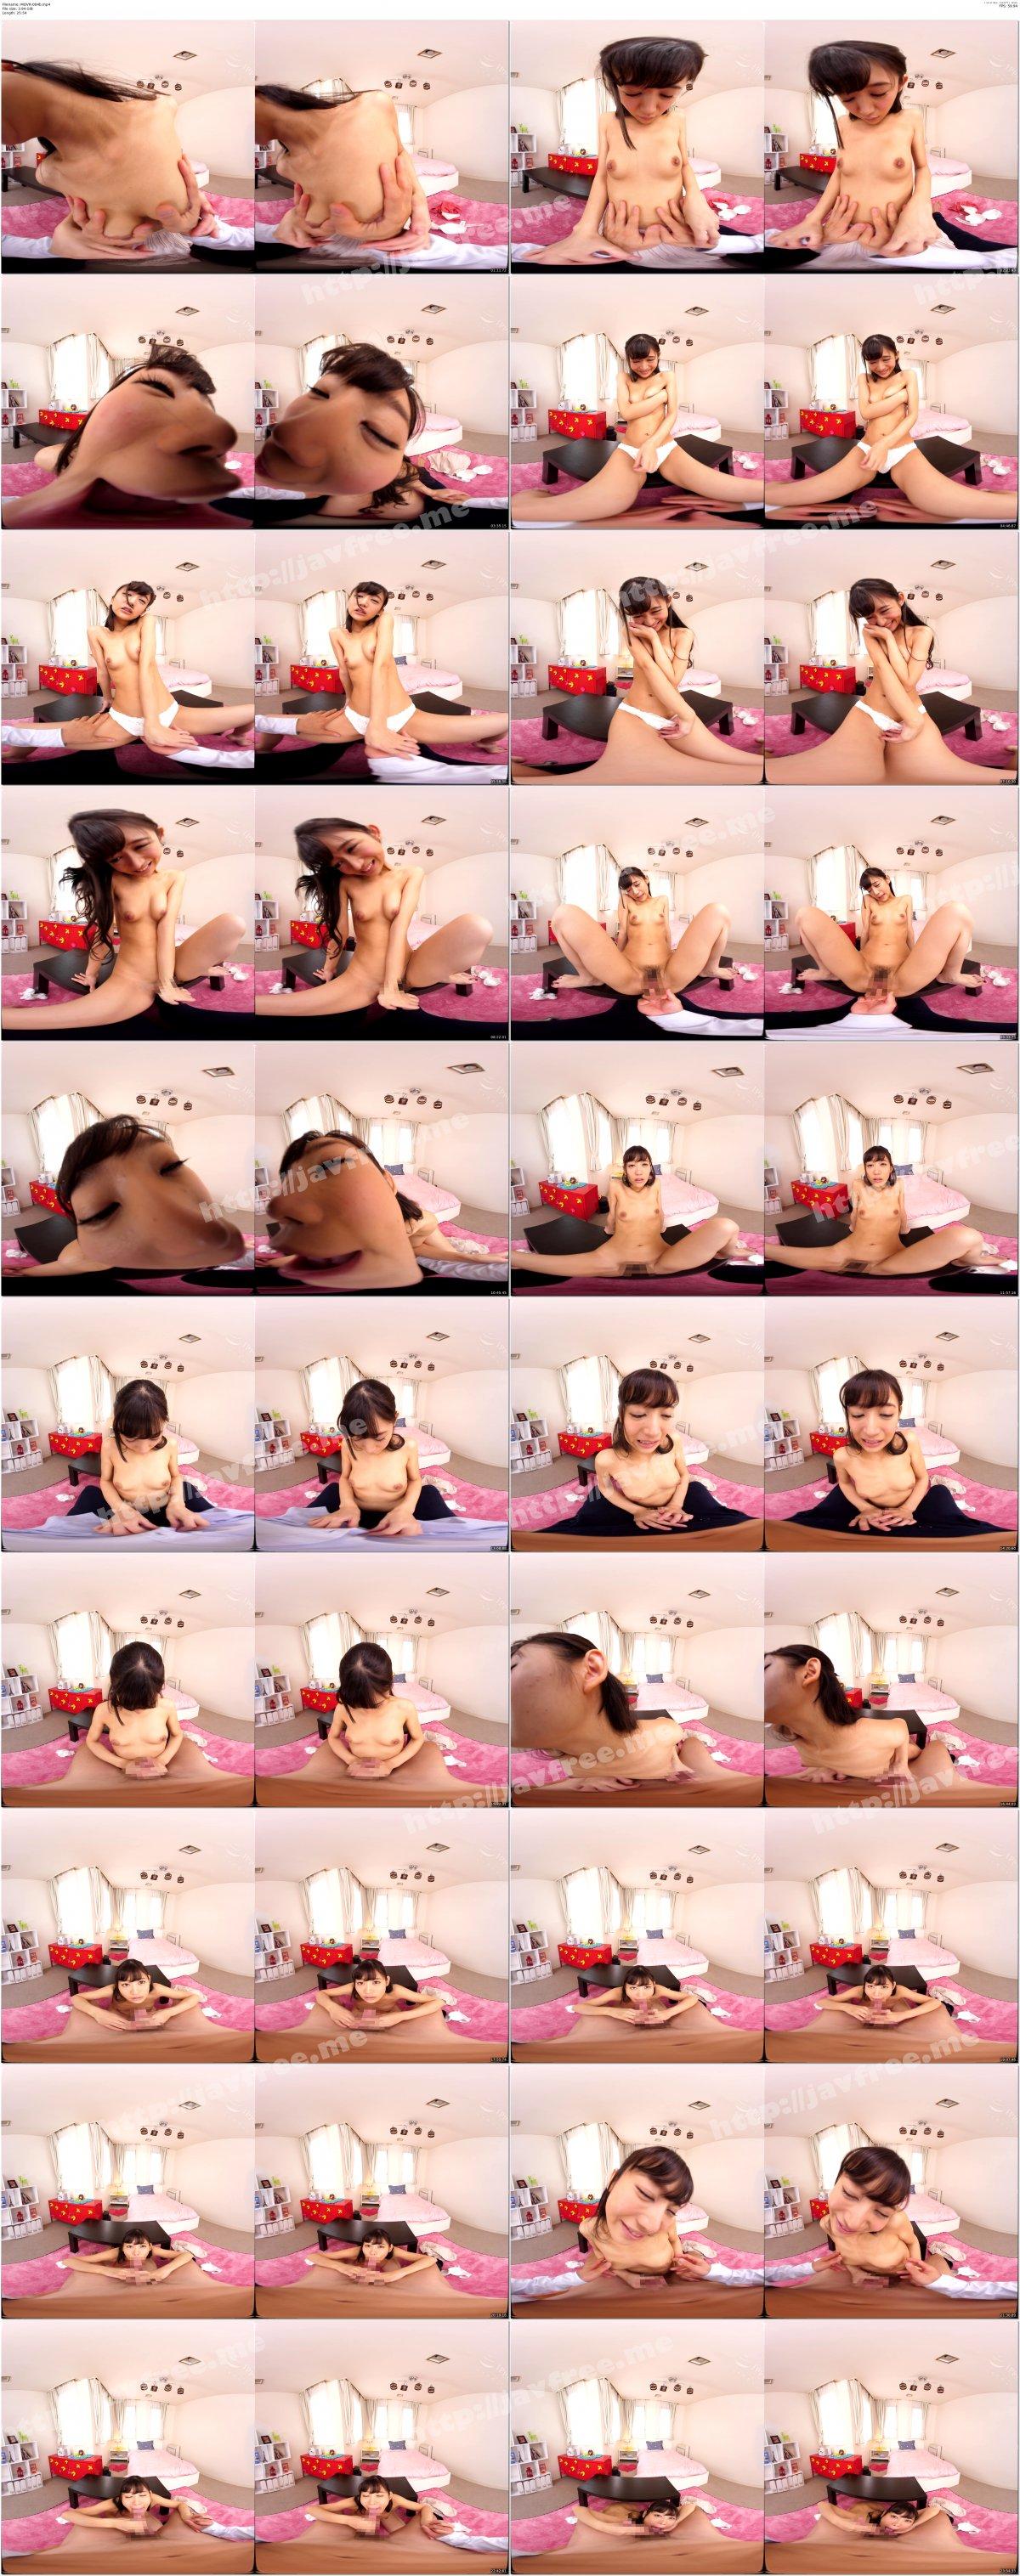 [MOVR-004] 【VR】つきあって1ヶ月の甘えん坊な彼女の部屋で遂にイチャラブ初エッチ - image MOVR-004b on https://javfree.me